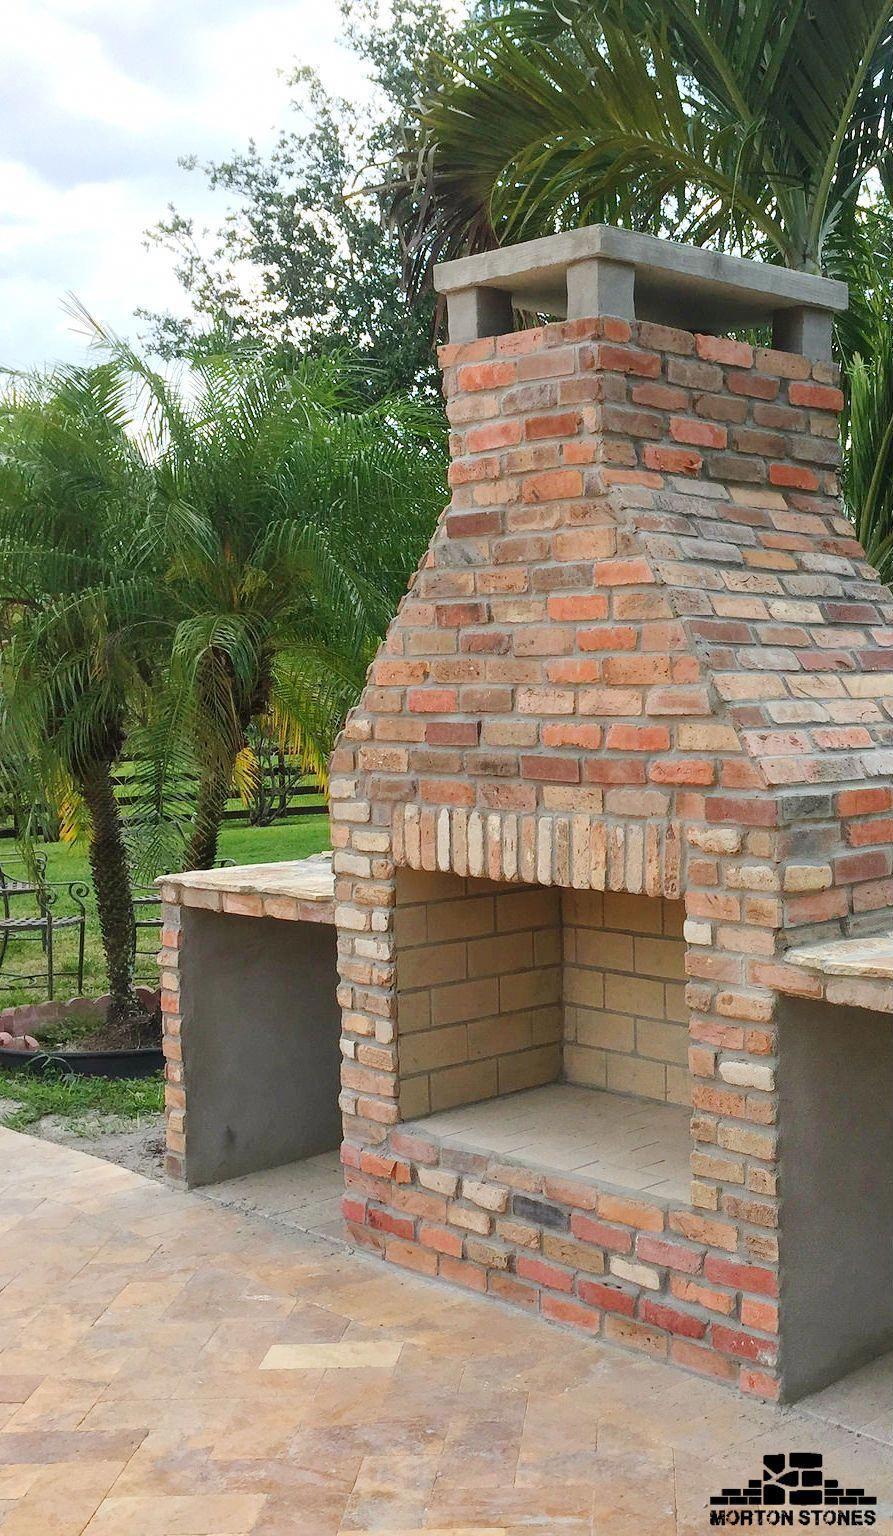 The Perfect Brick Fireplace! #mortonstones #brick #tiles #backyard #home # Decor #brickveneer #exterior #homeimprovement #thinbrick #fireplace ...